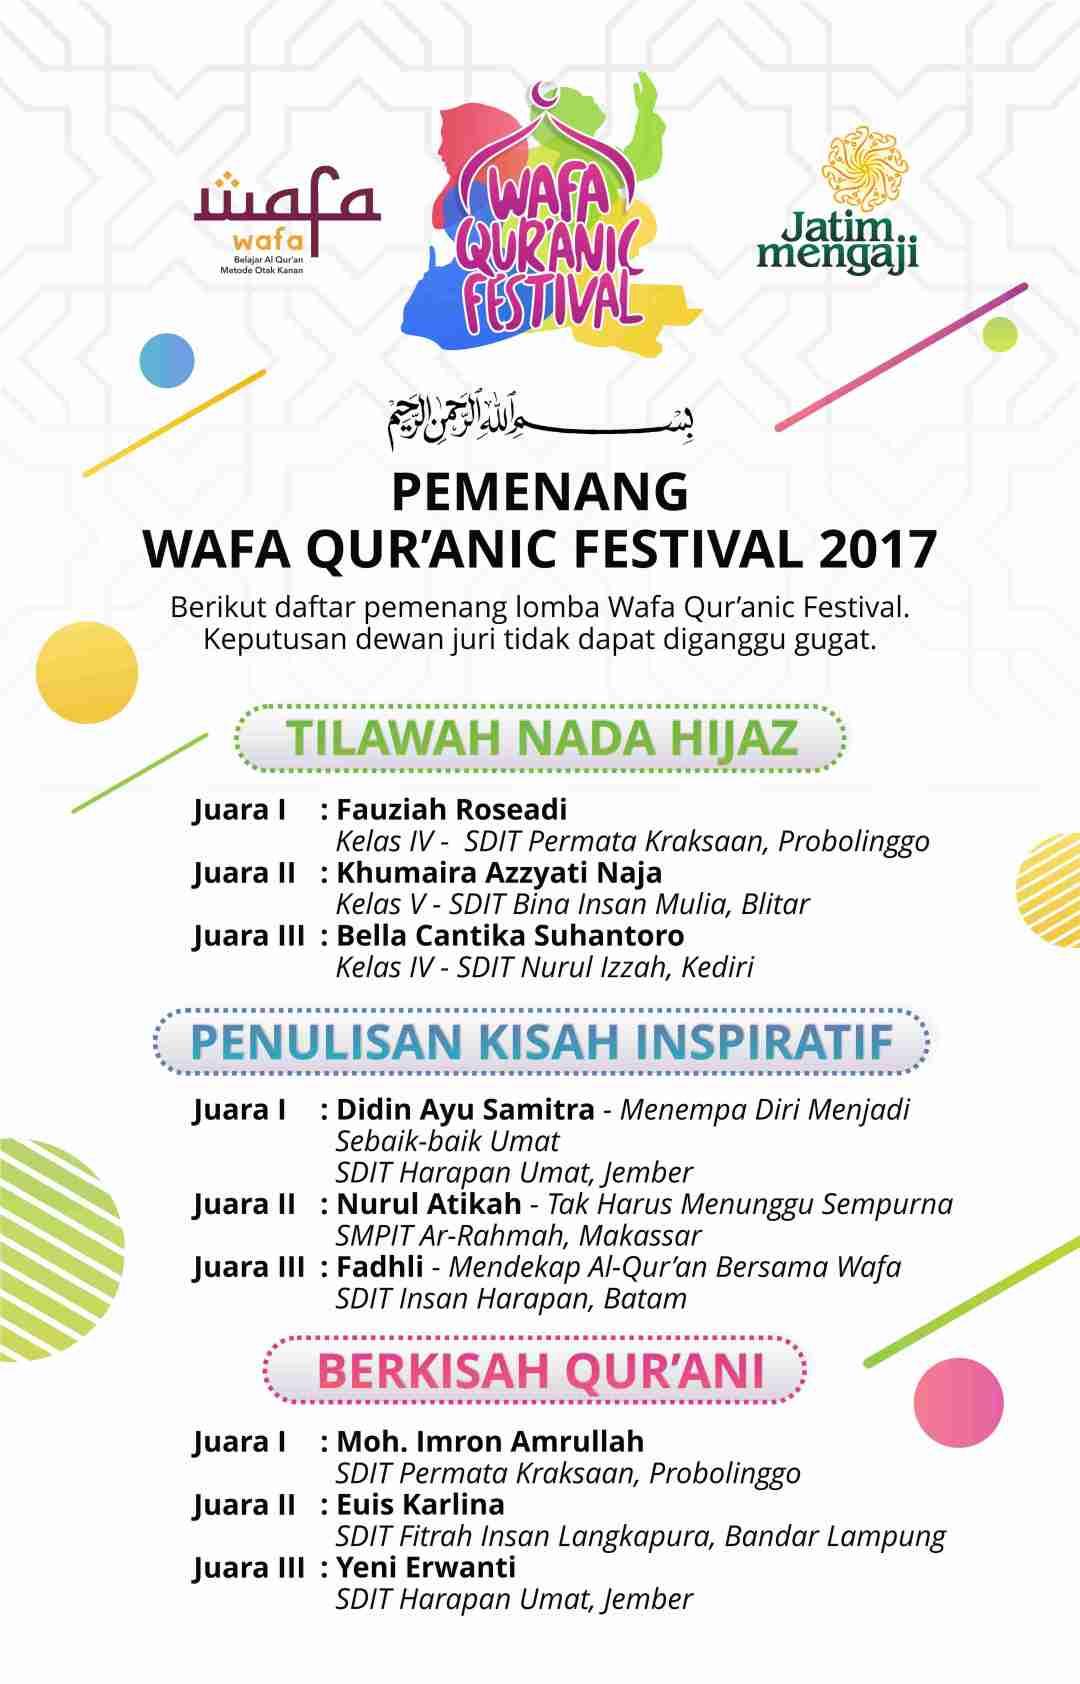 Pemenang WAFA Festival 2017